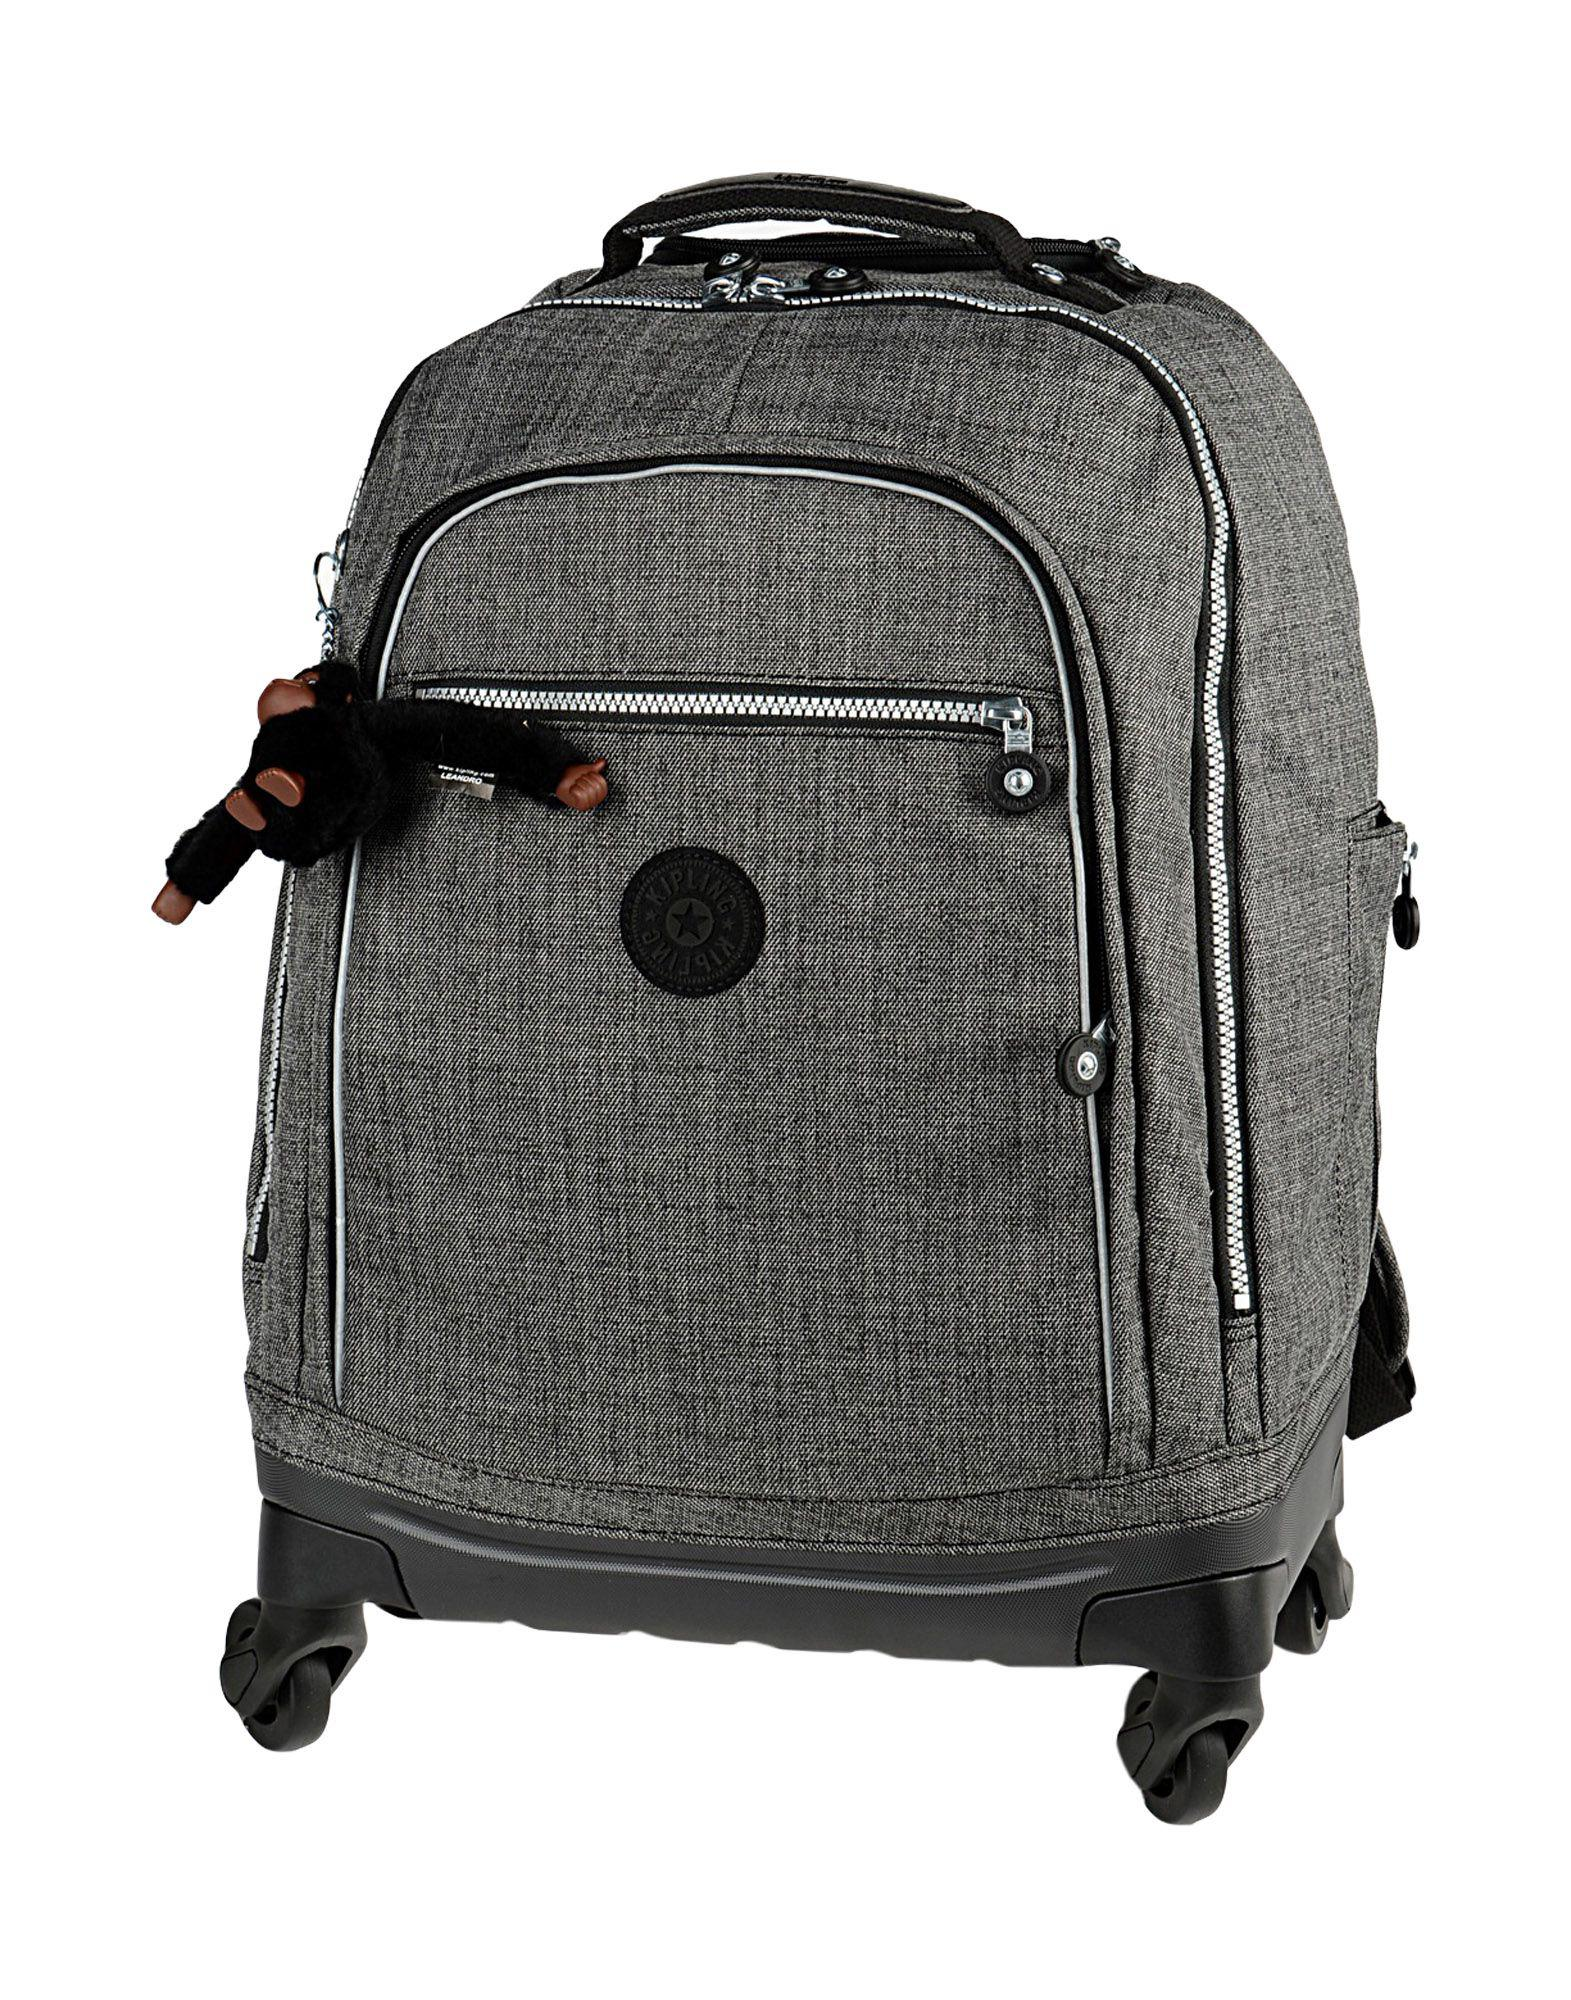 BAGS - Backpacks & Bum bags Kipling RXY2P